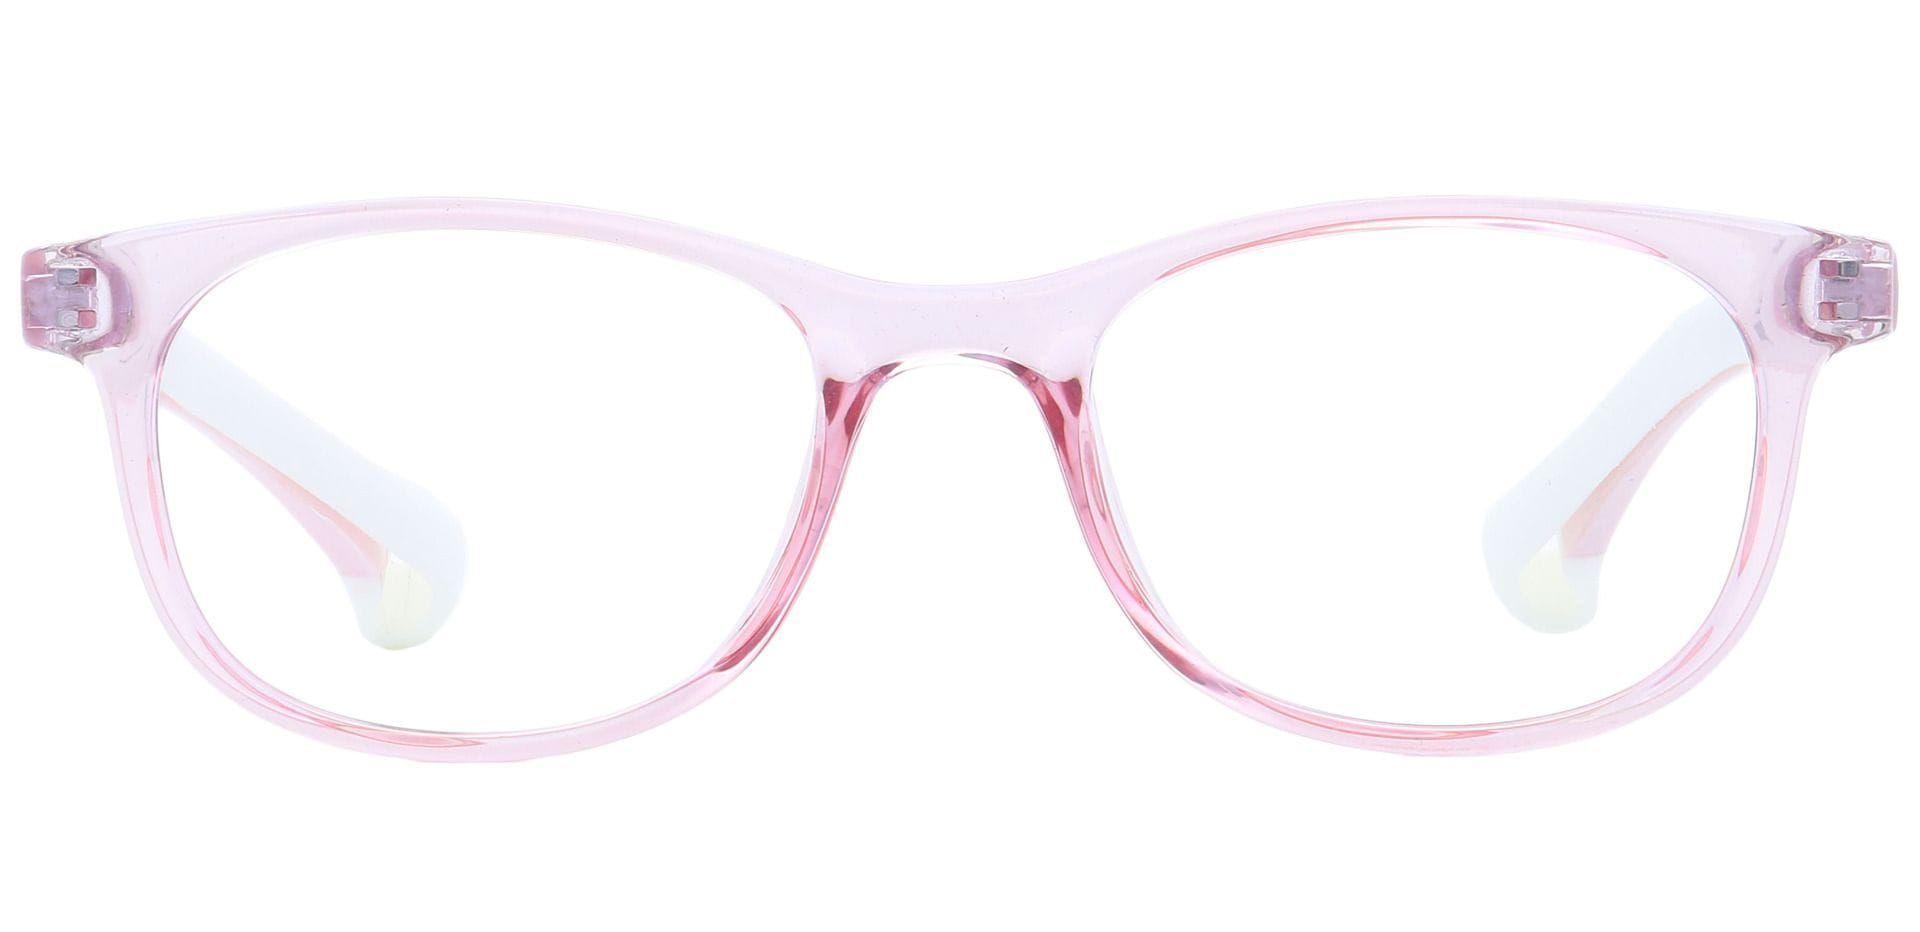 Joy Round Lined Bifocal Glasses - Pink